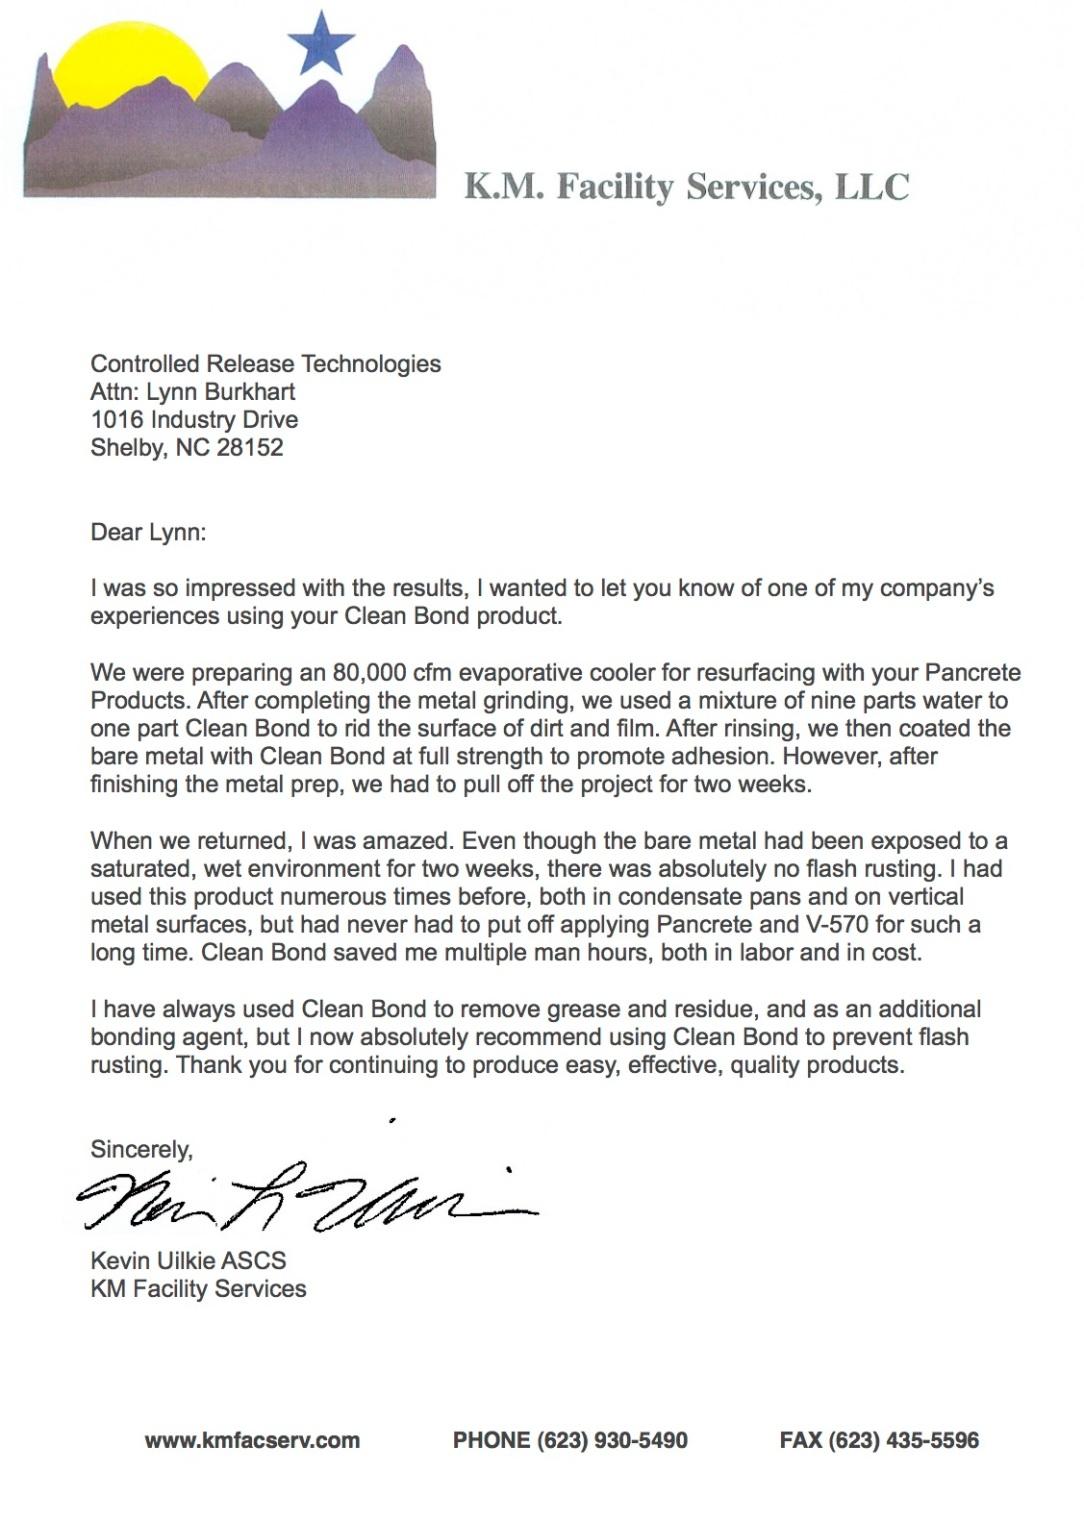 CB Letter of Rec